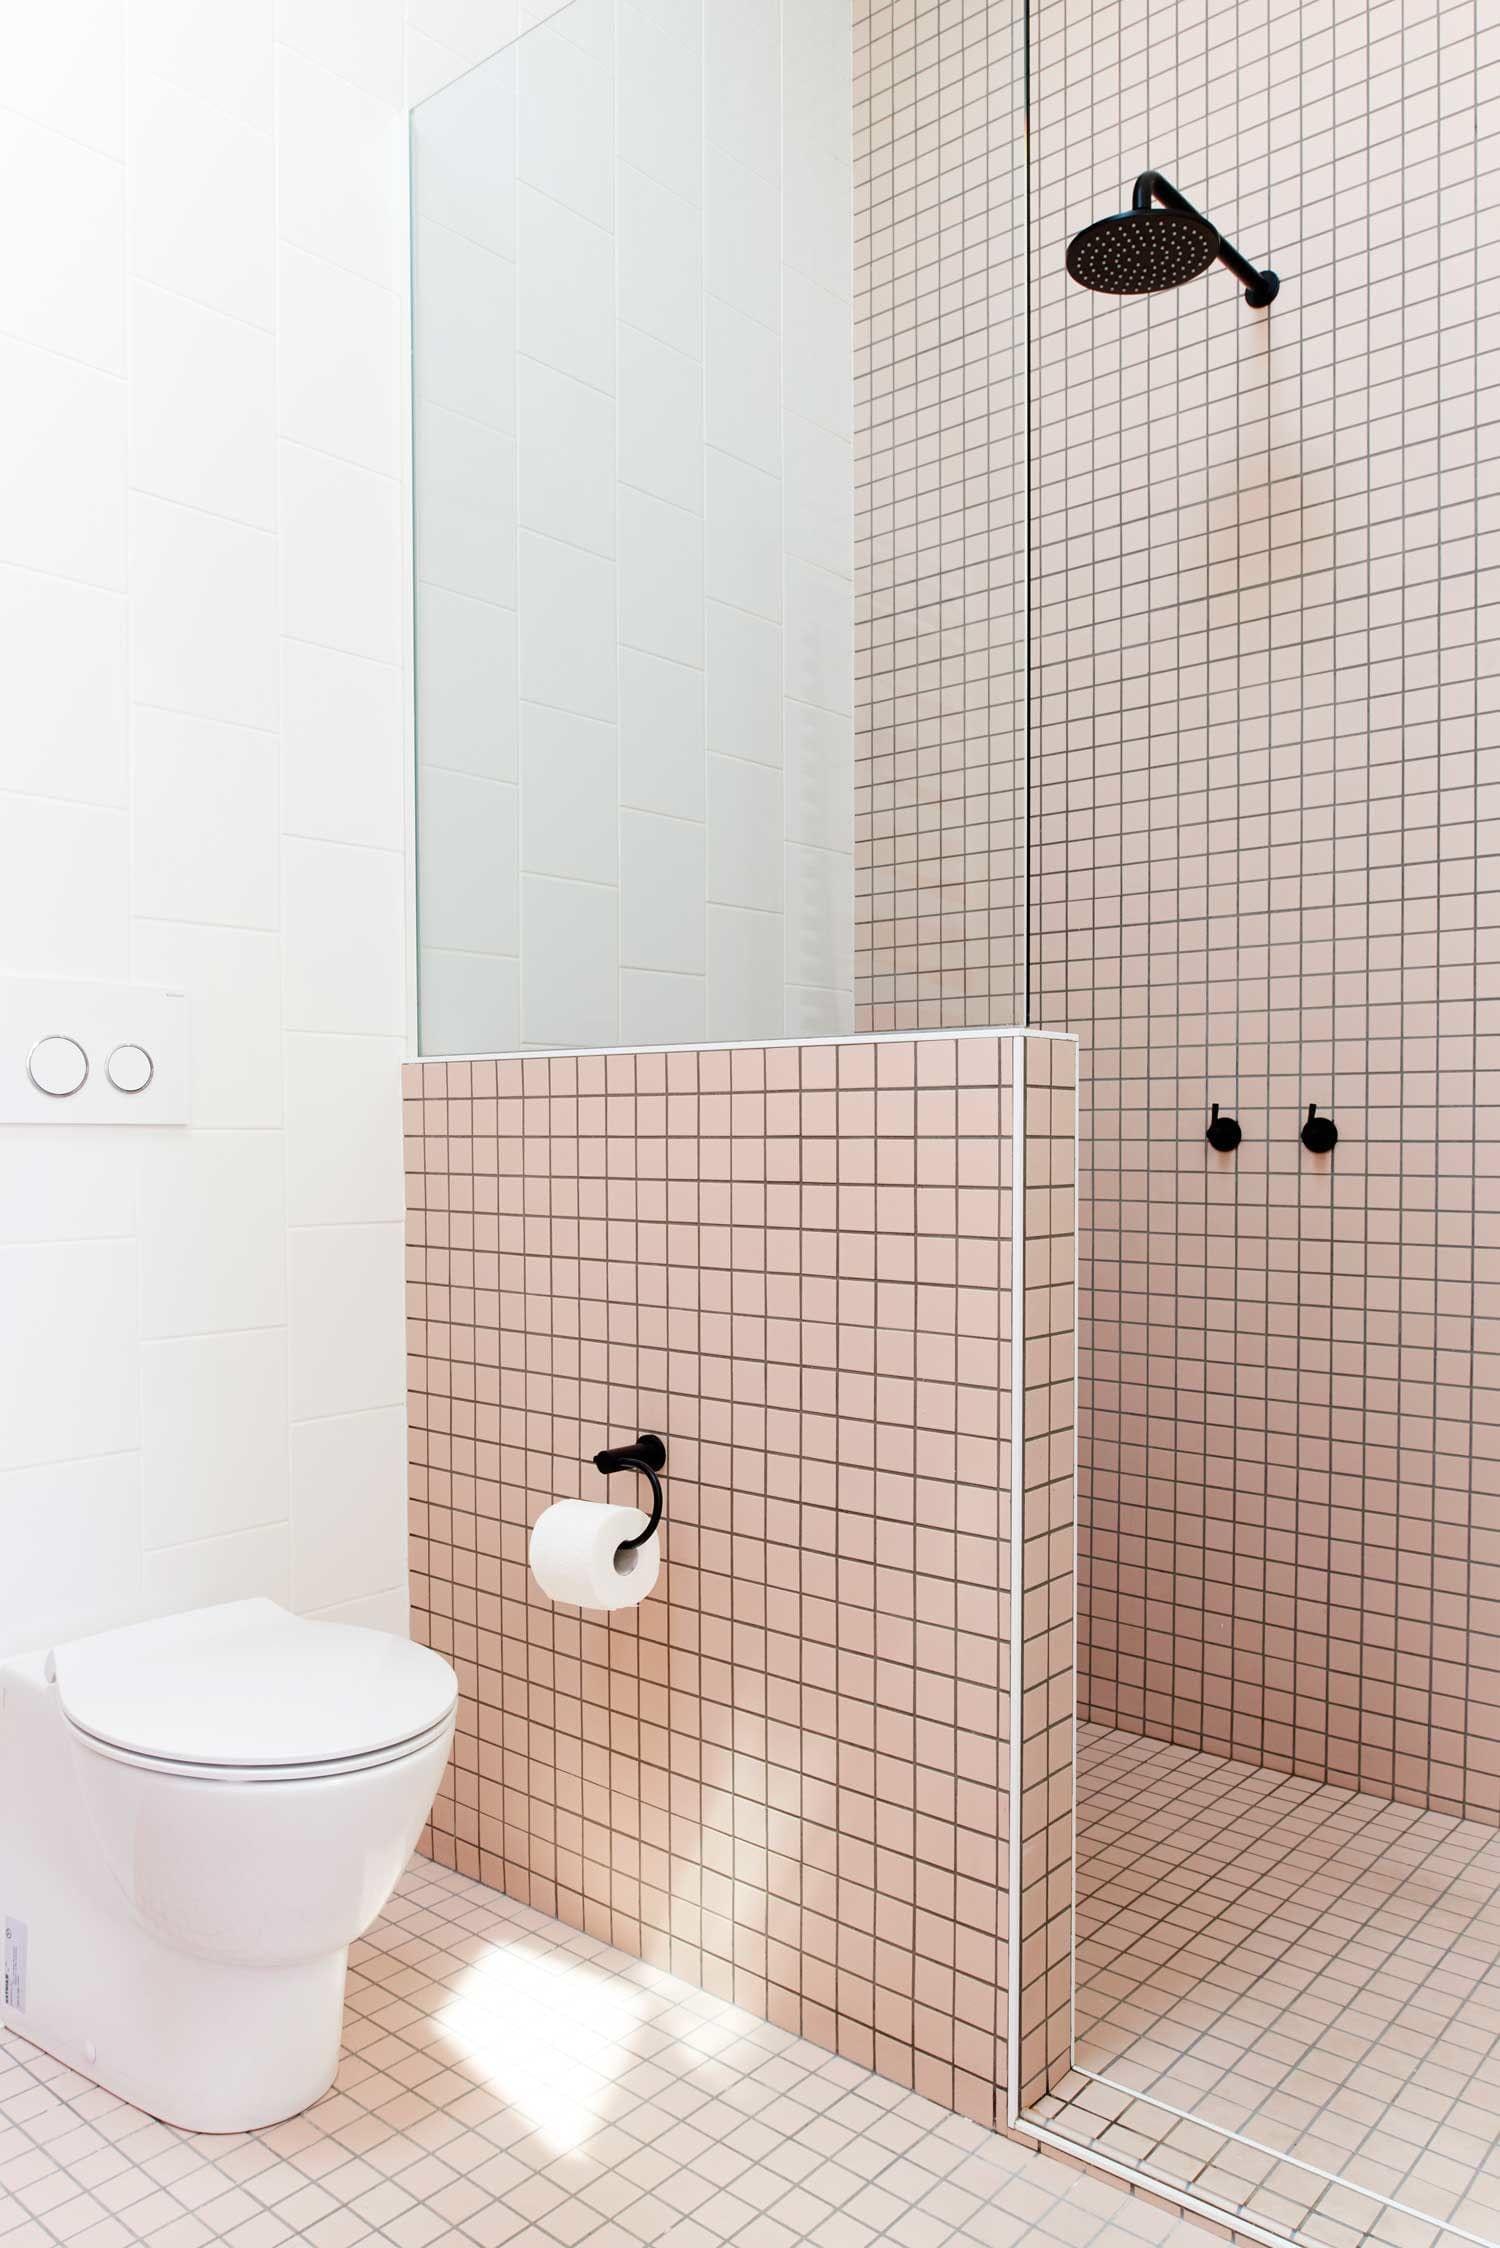 Unexpected Utterly Gorgeous Tile Grout Combos Pinterest - Rosa fliesen bad